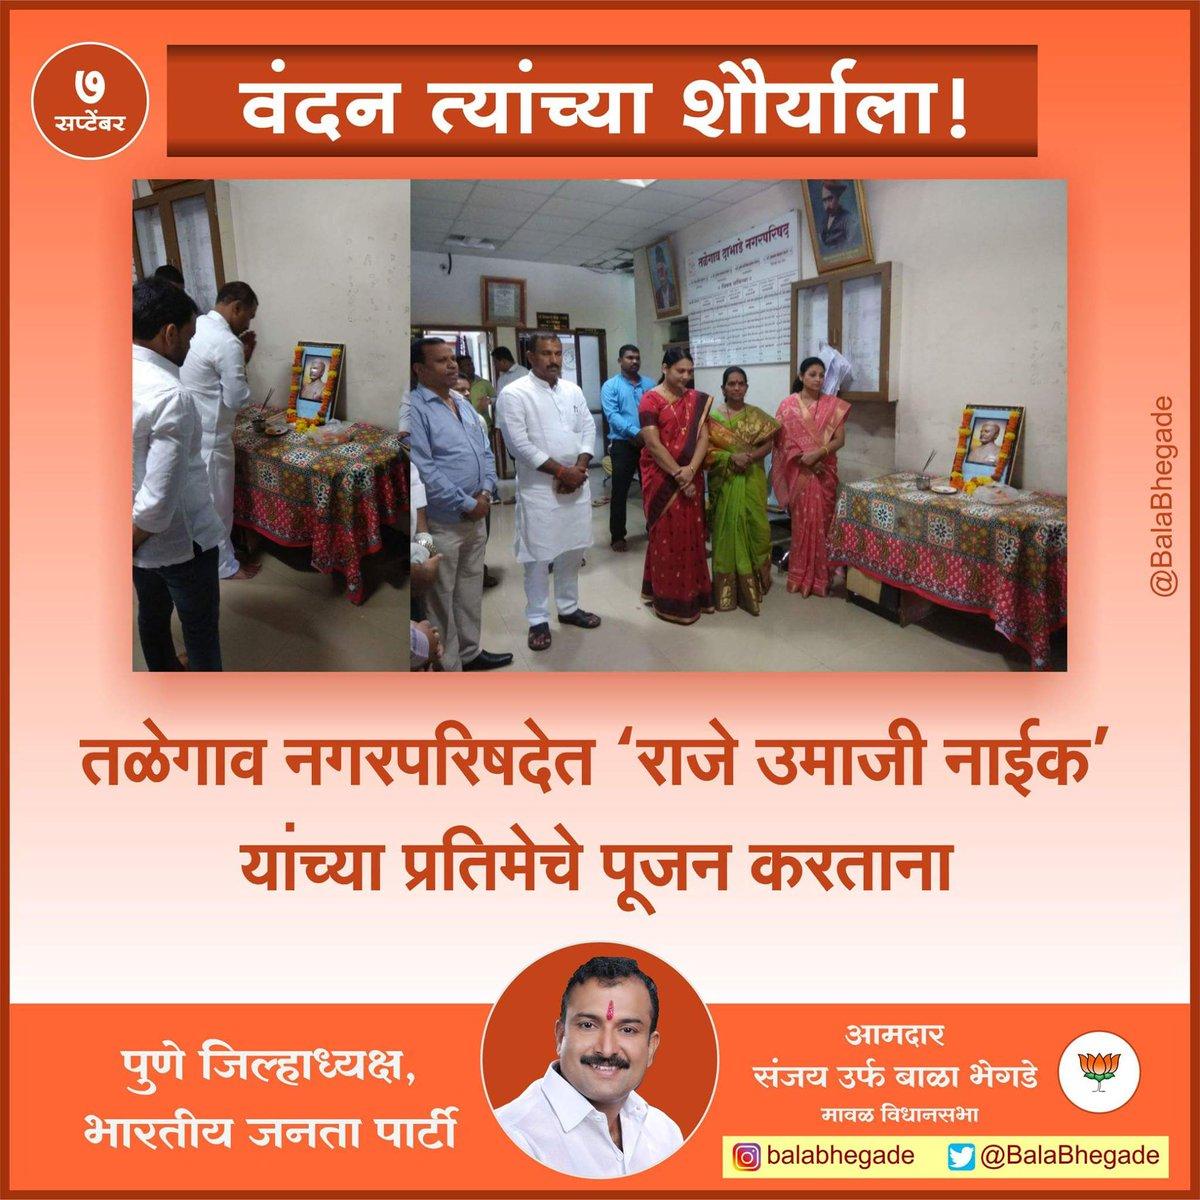 Devendra Fadnavis On Twitter Paid Floral Tributes To Adya Krantiveer Raje Umaji Naik On His Birth Anniversary At Mantralaya This Morning